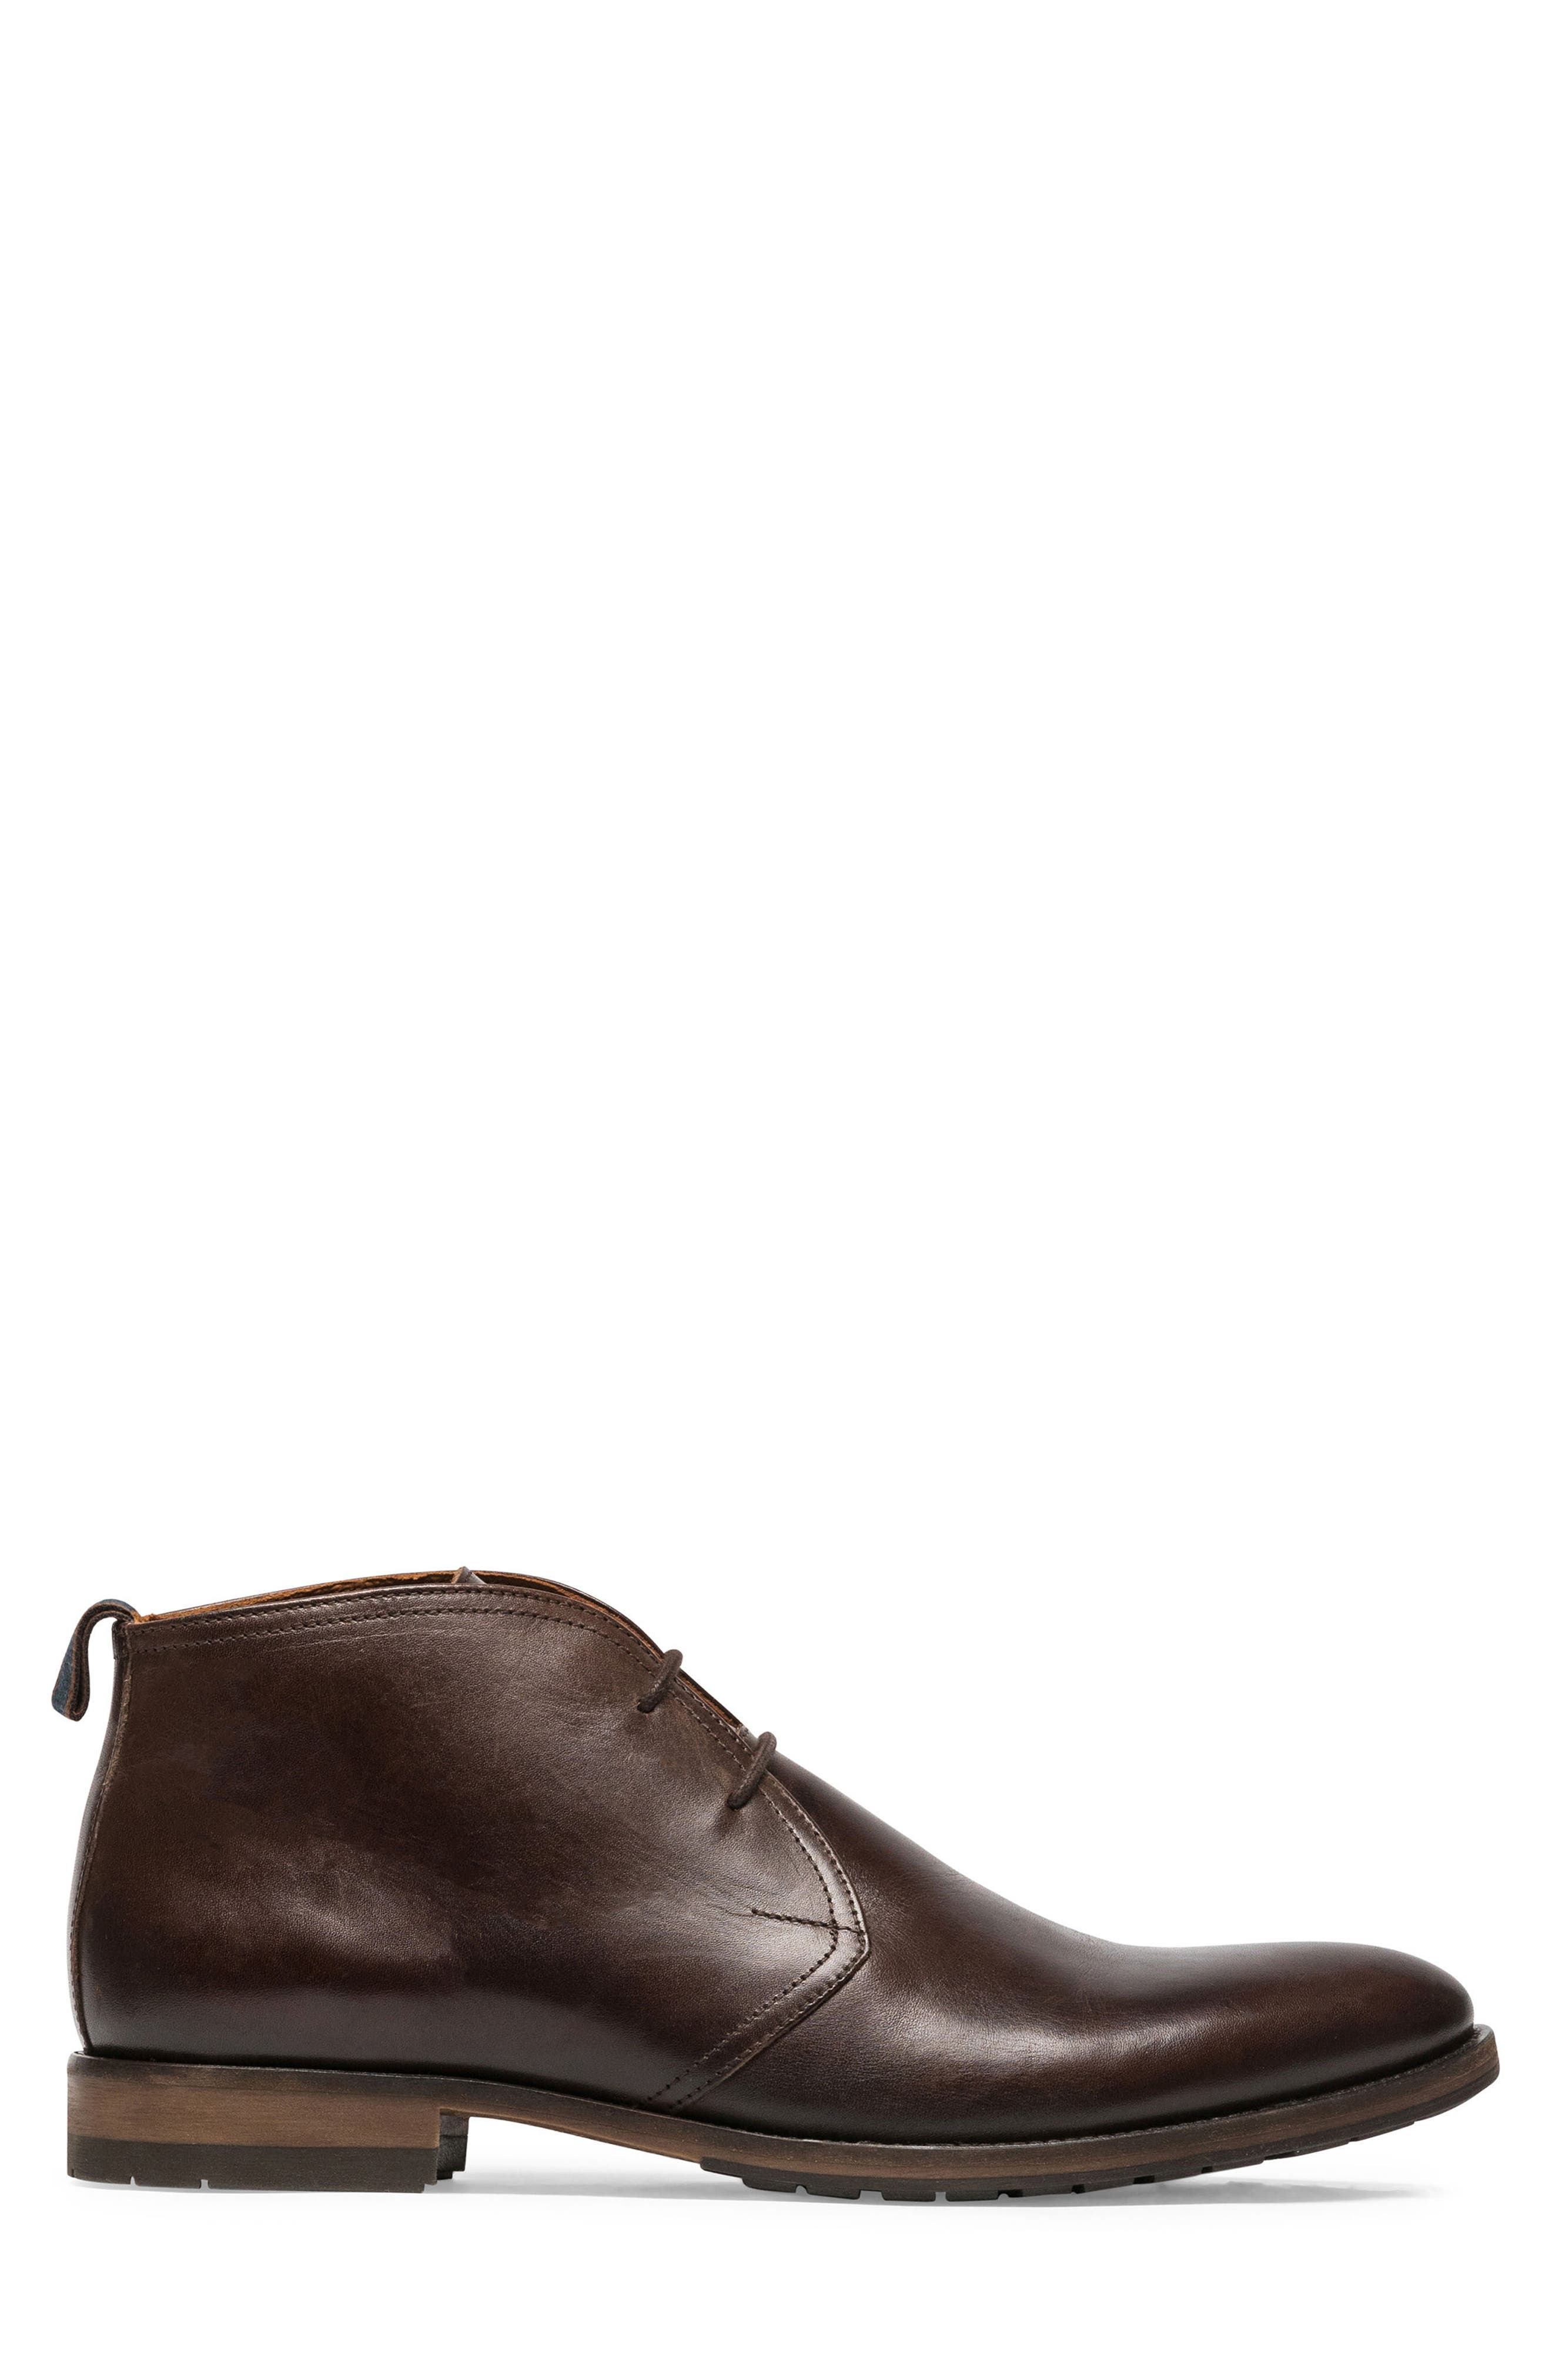 Alternate Image 3  - Rodd & Gunn Pebbly Hill Chukka Boot (Men)